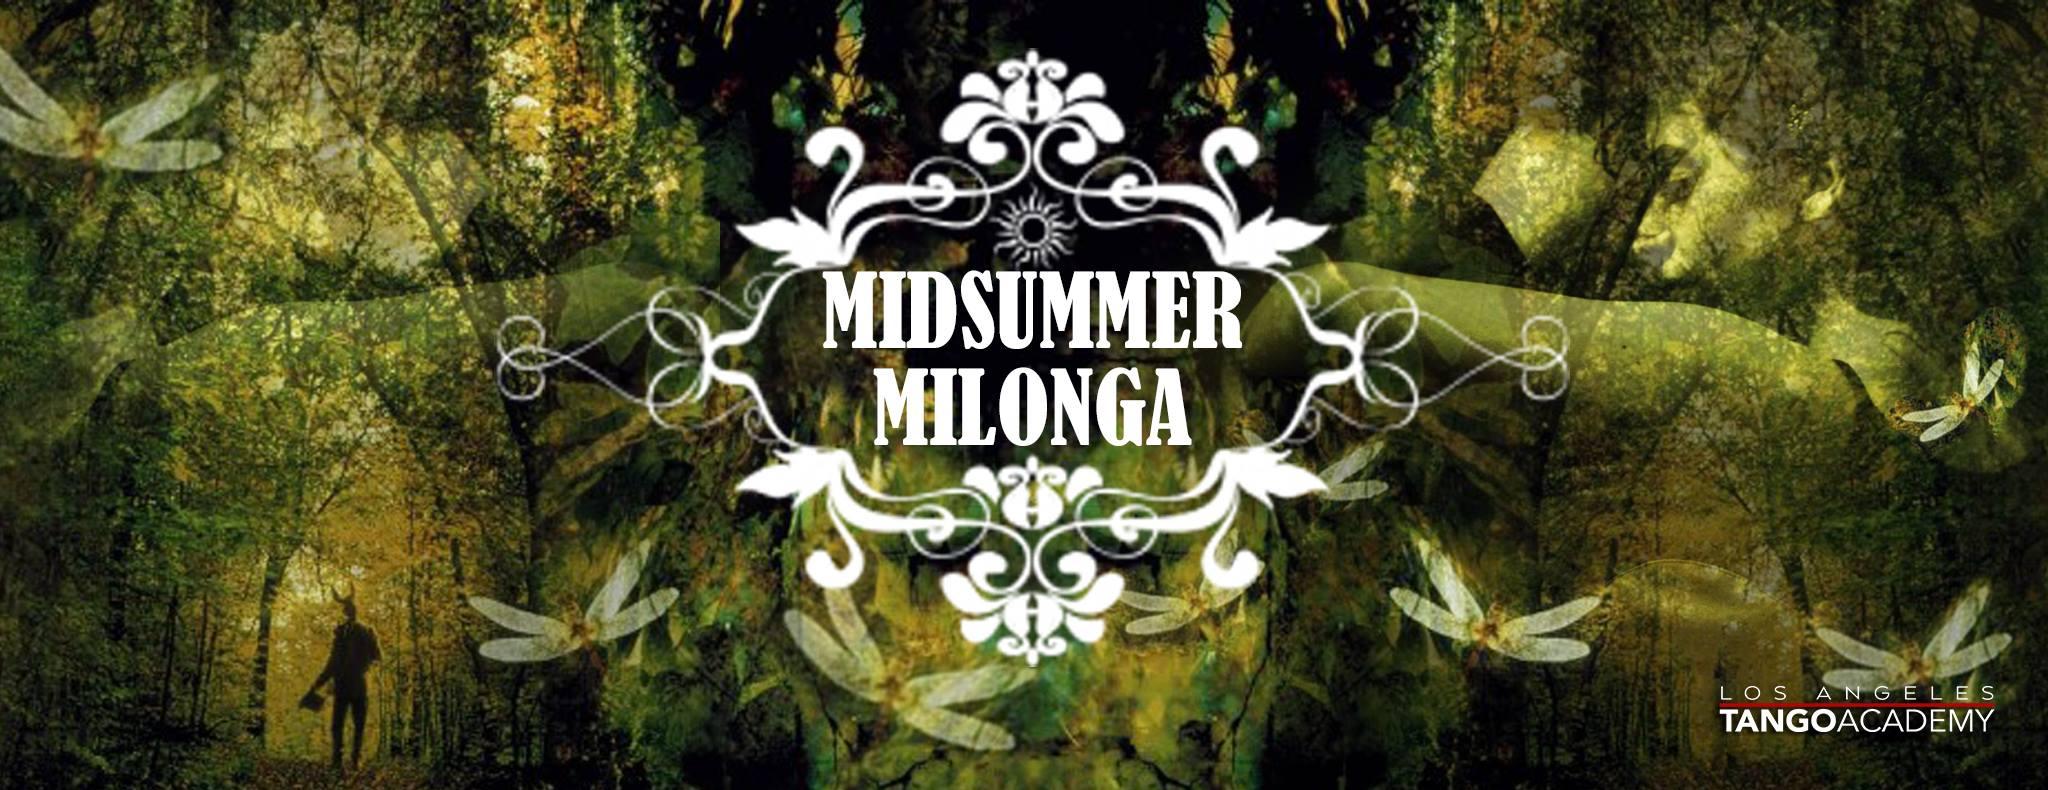 summer milonga